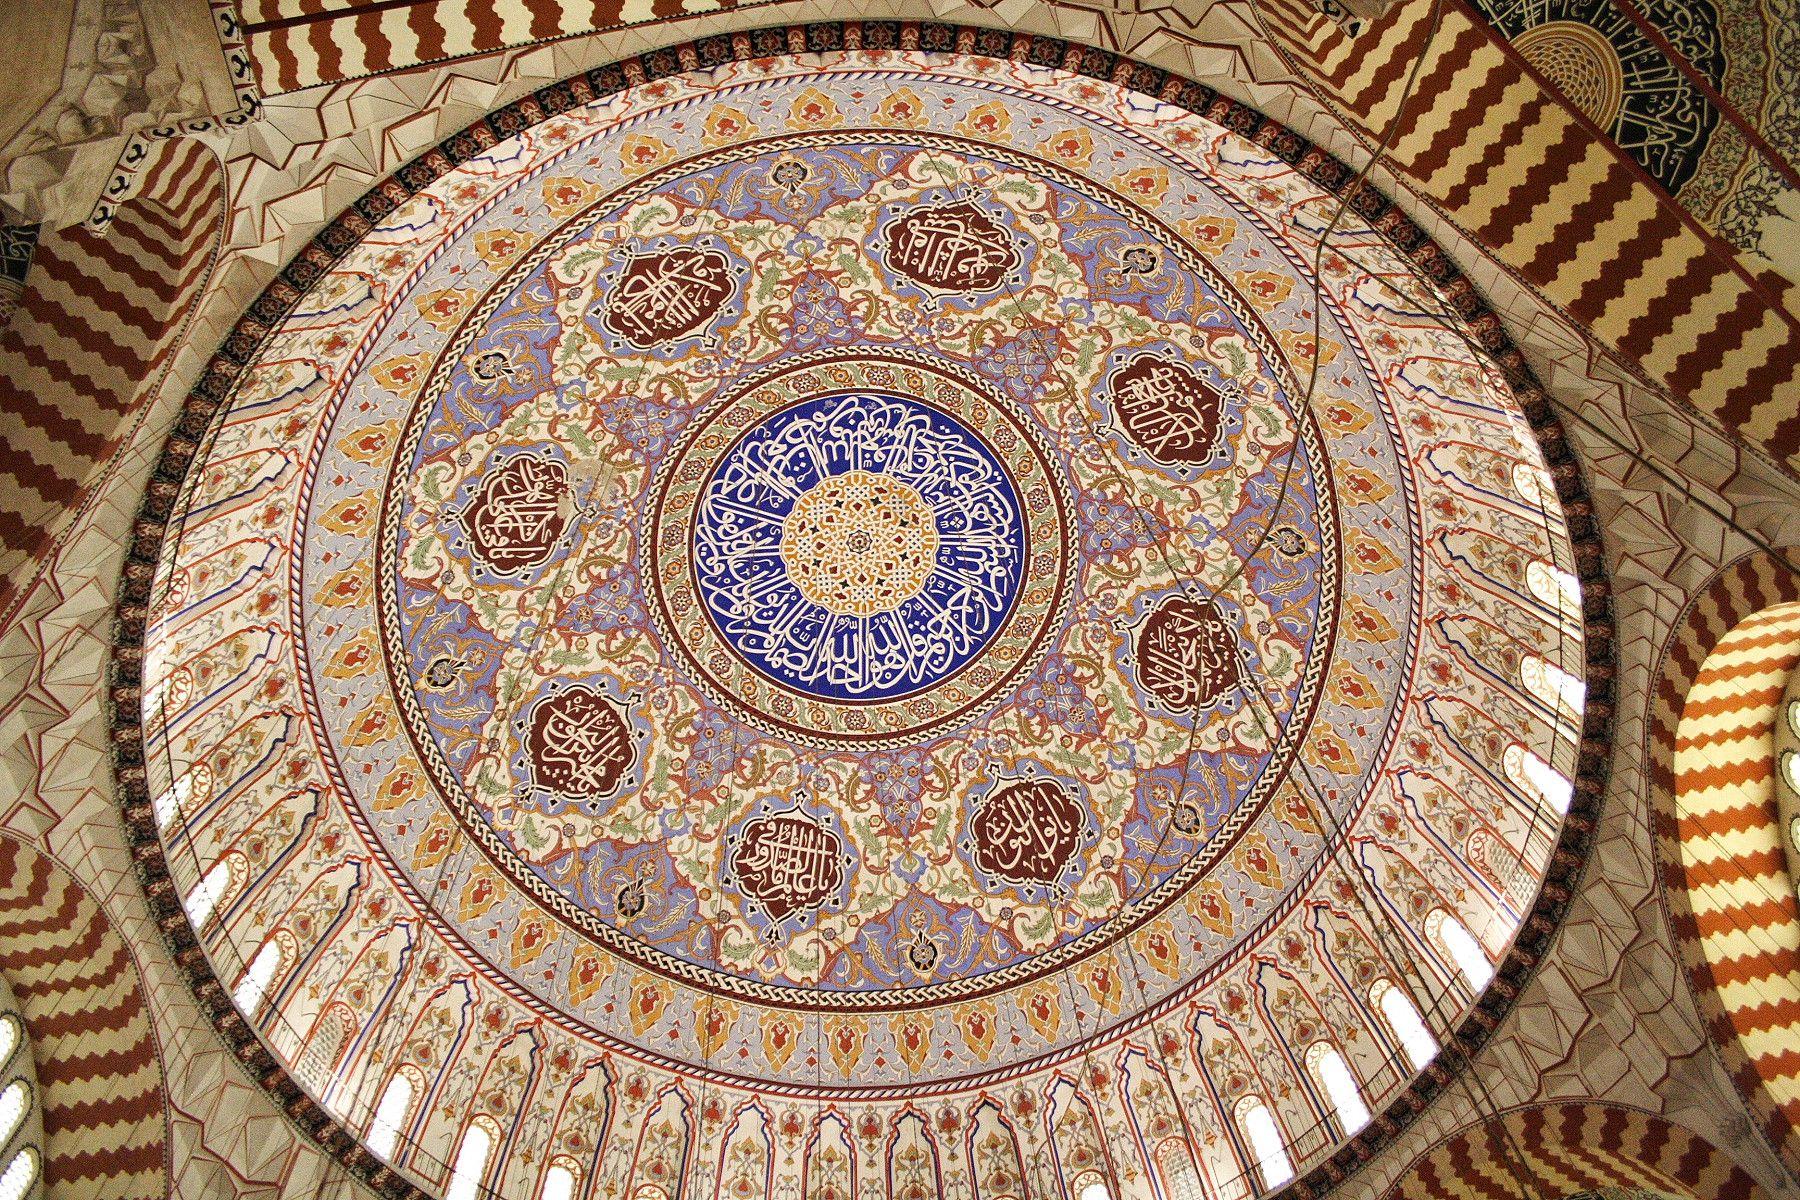 Selimiye_Mosque,_Dome.jpg (1800×1200)